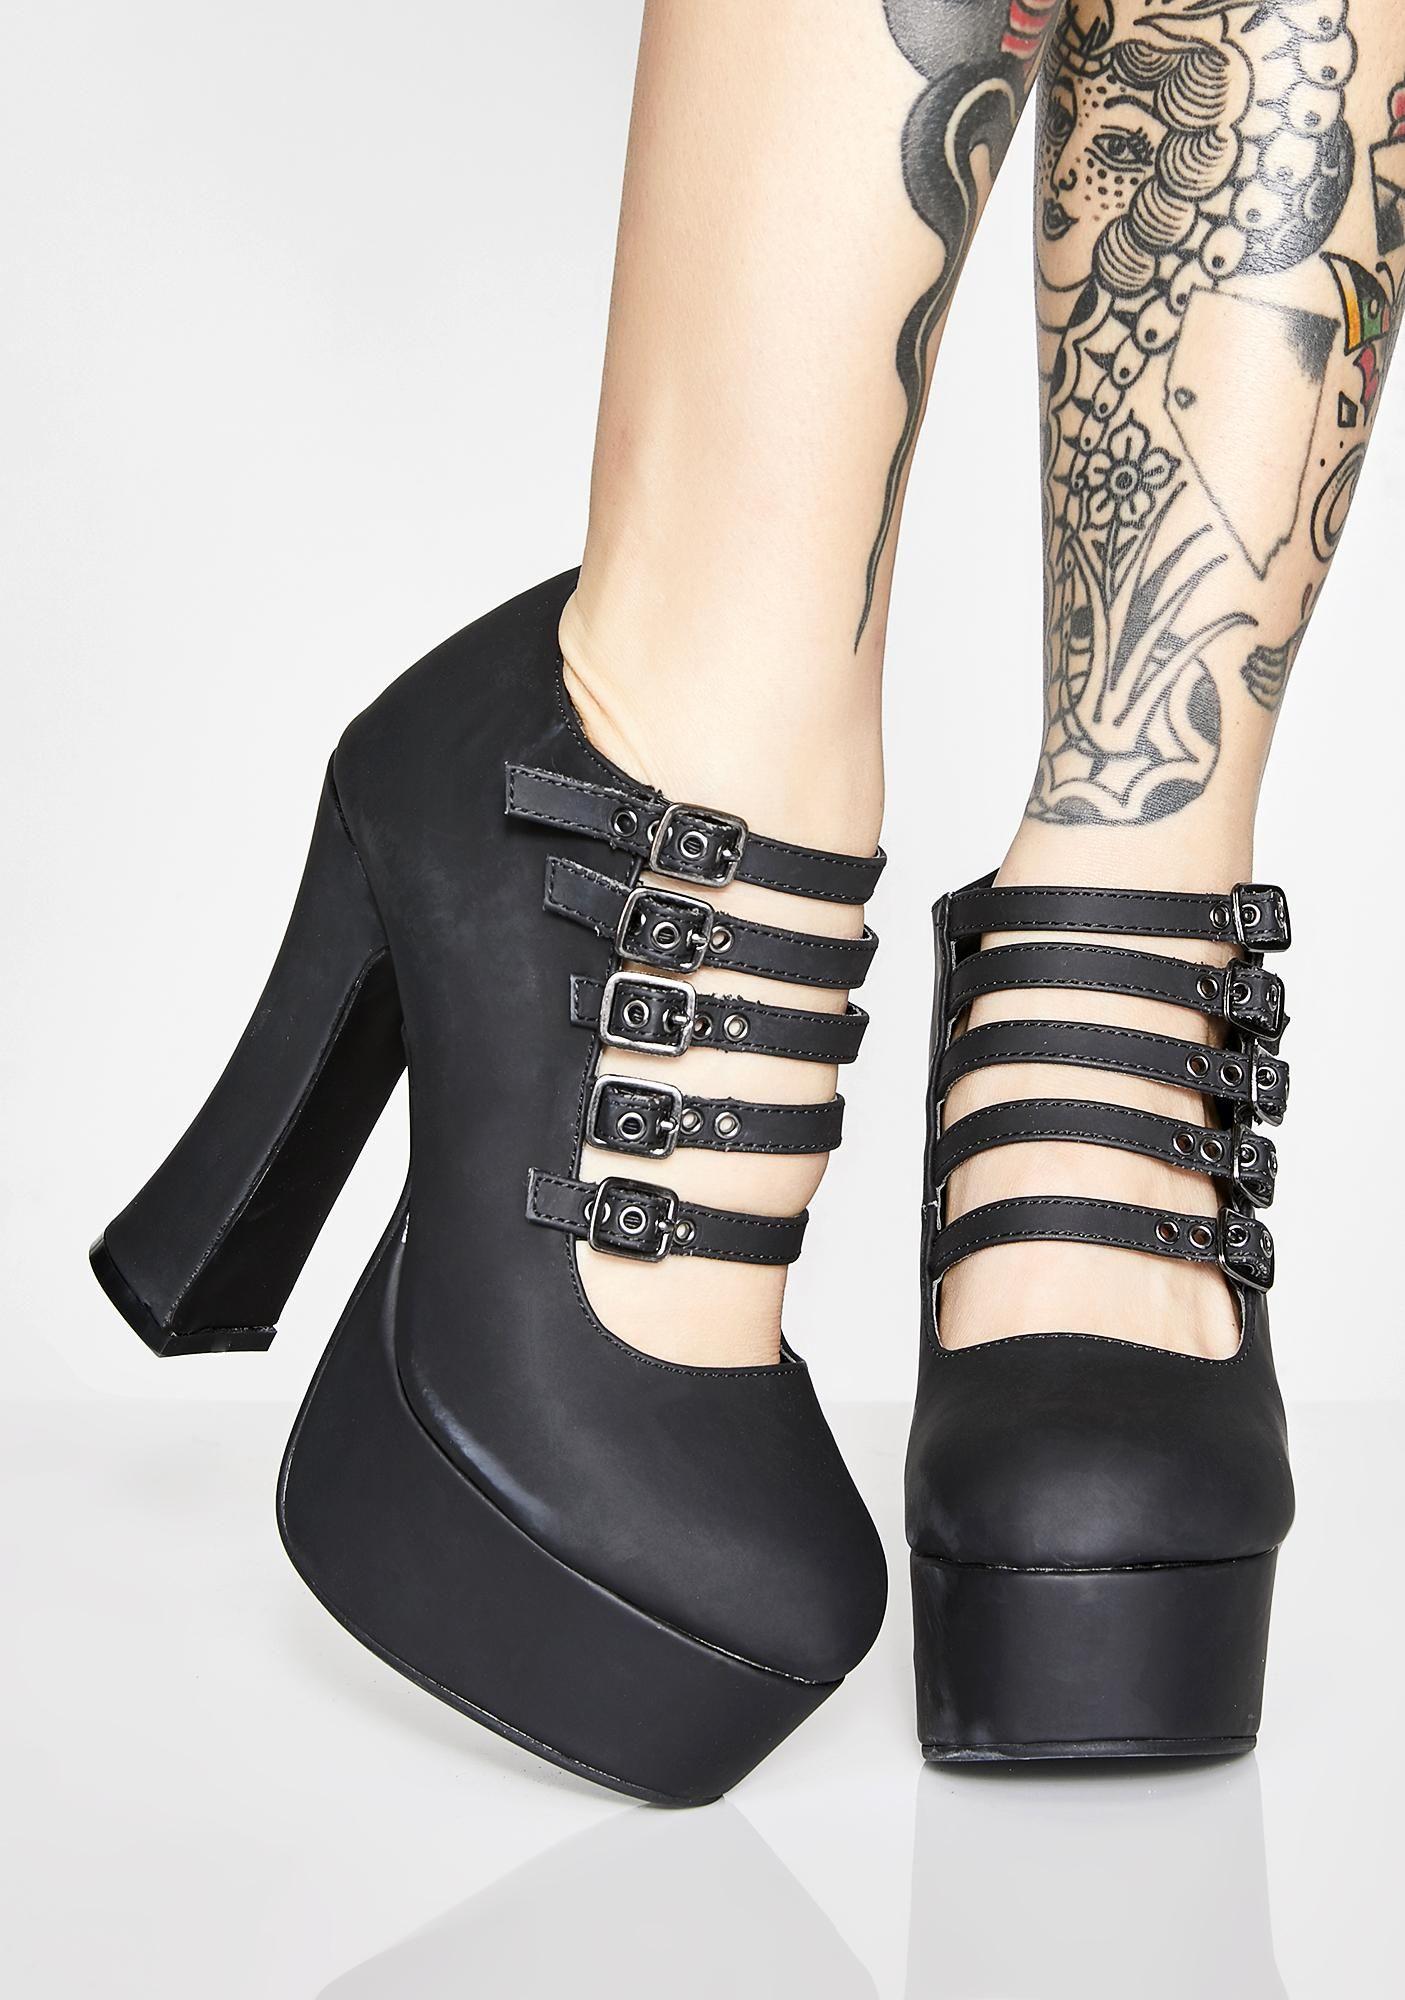 ac3edf0a193 T.U.K. Strappy Spice Platform Heels